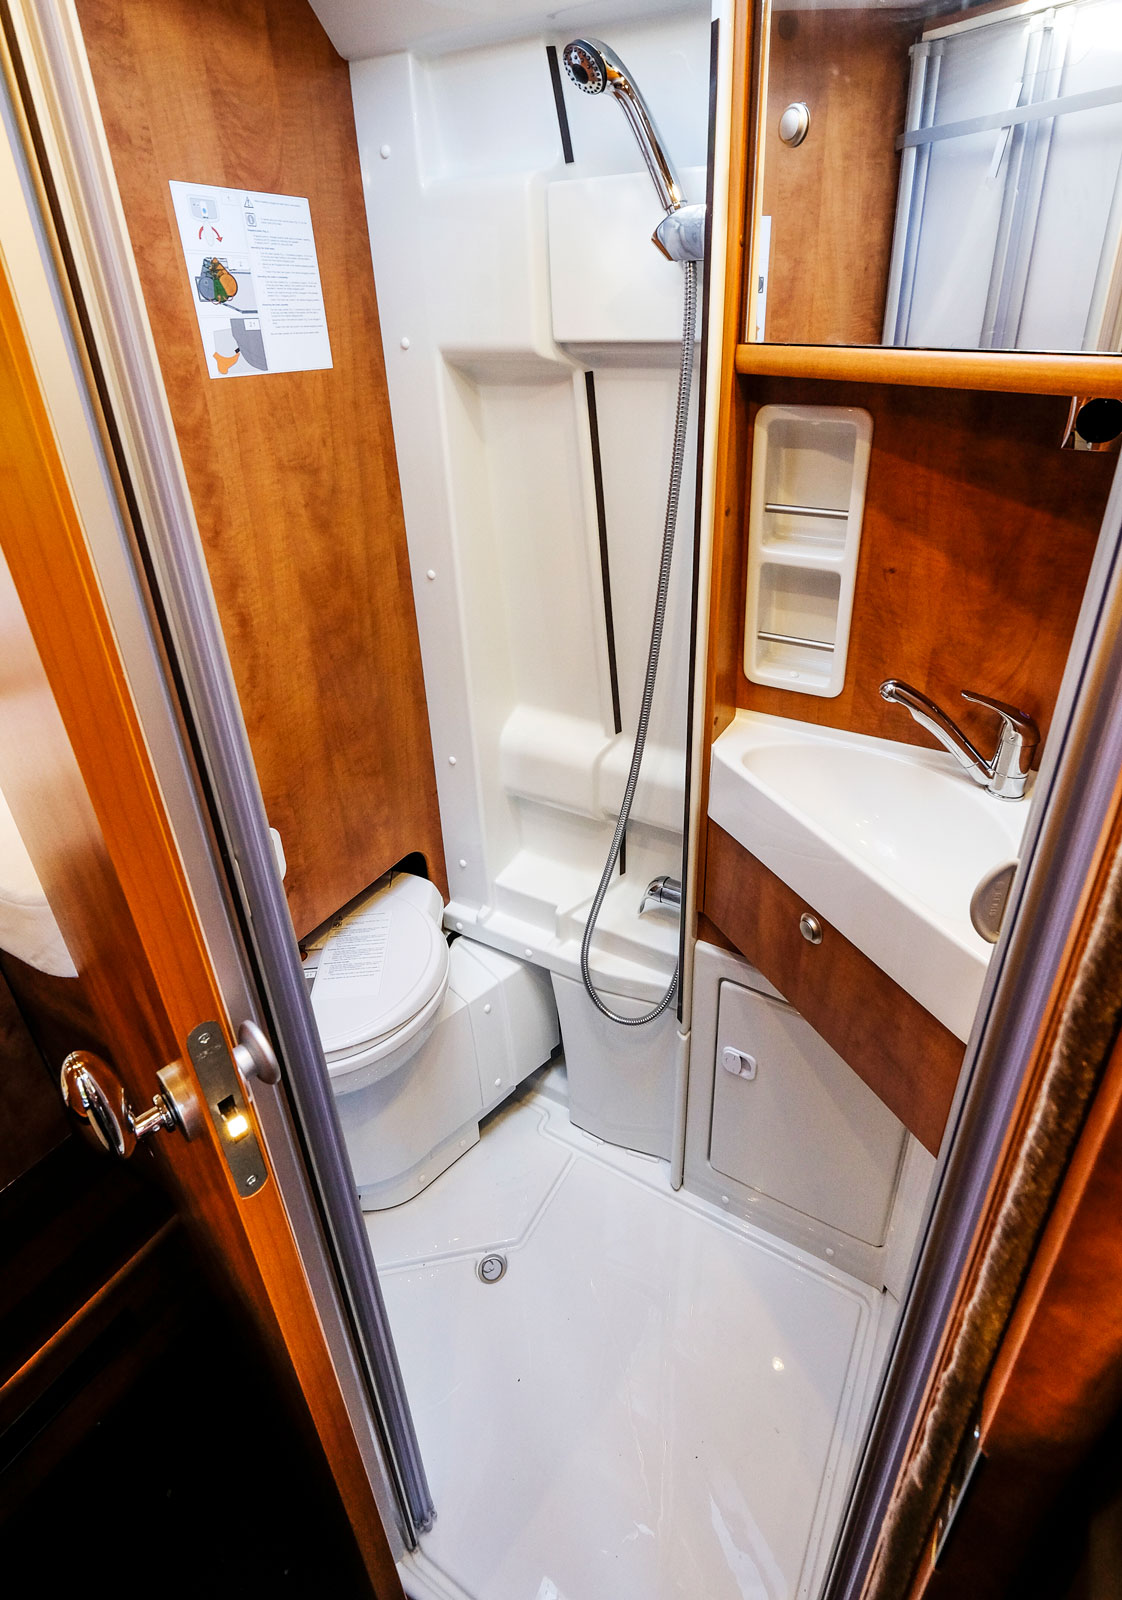 Med toalettstolen ur vägen blir det svängrum i duschen.